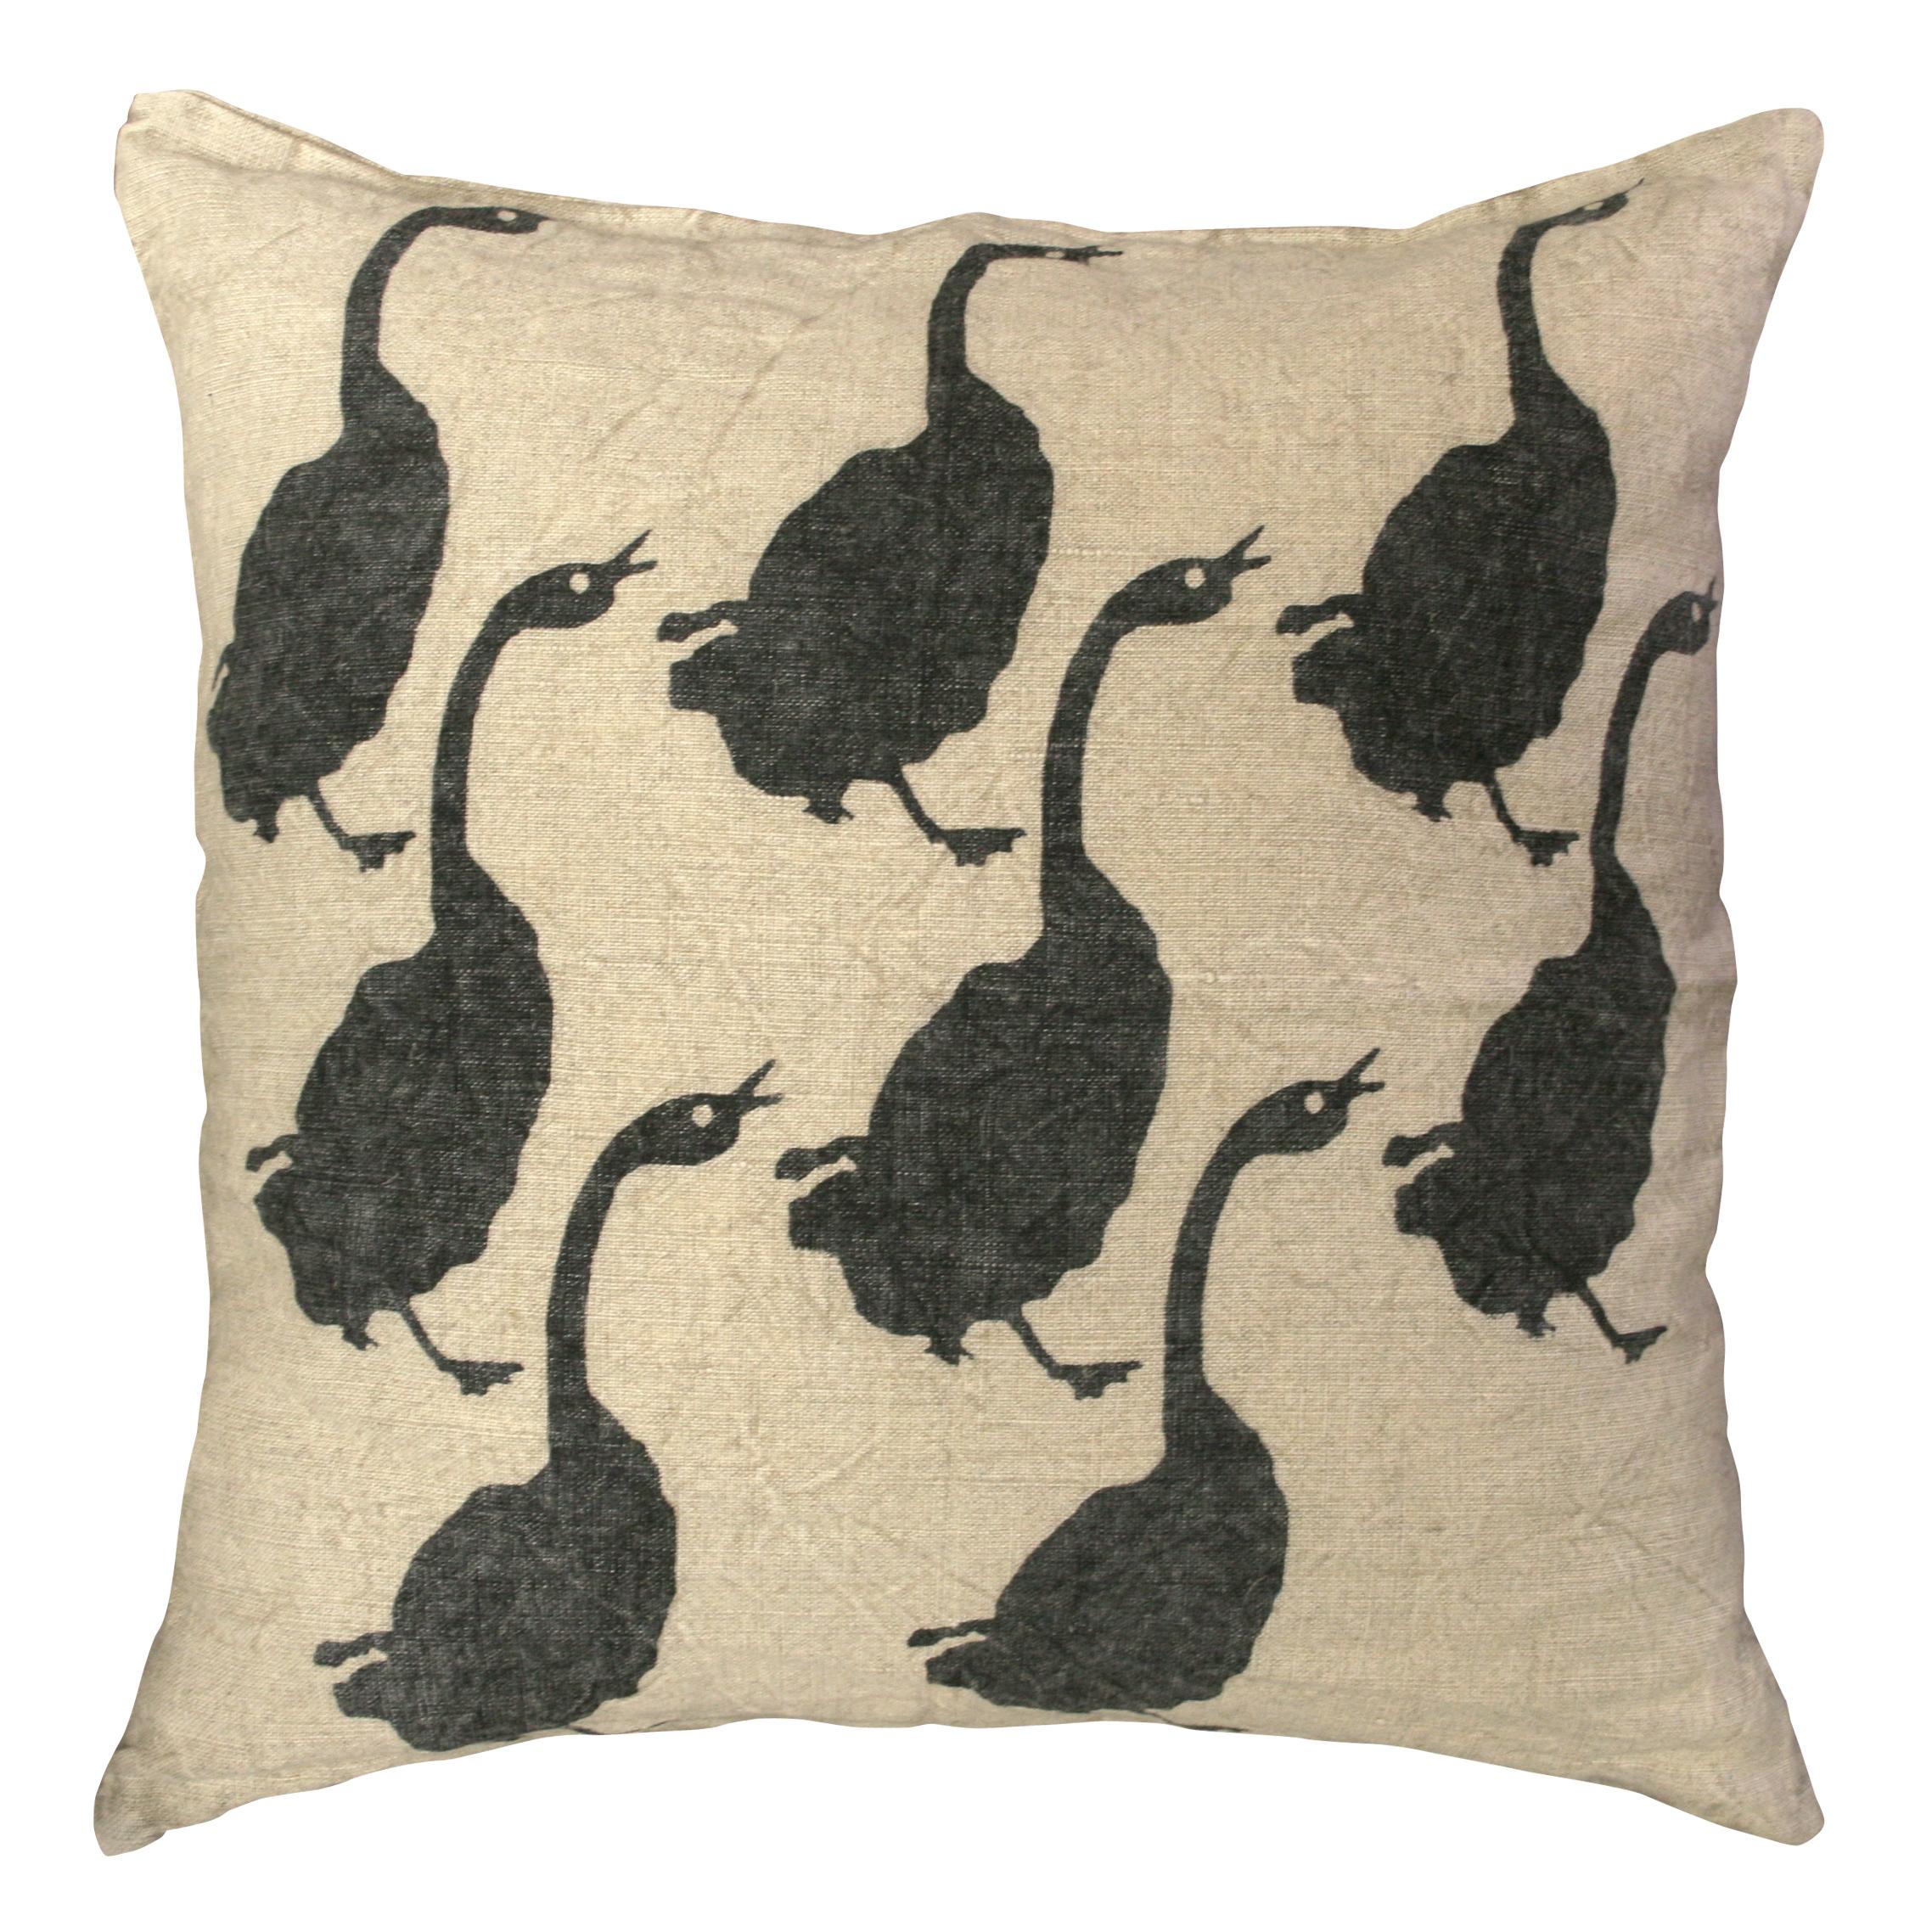 Geese Pillow